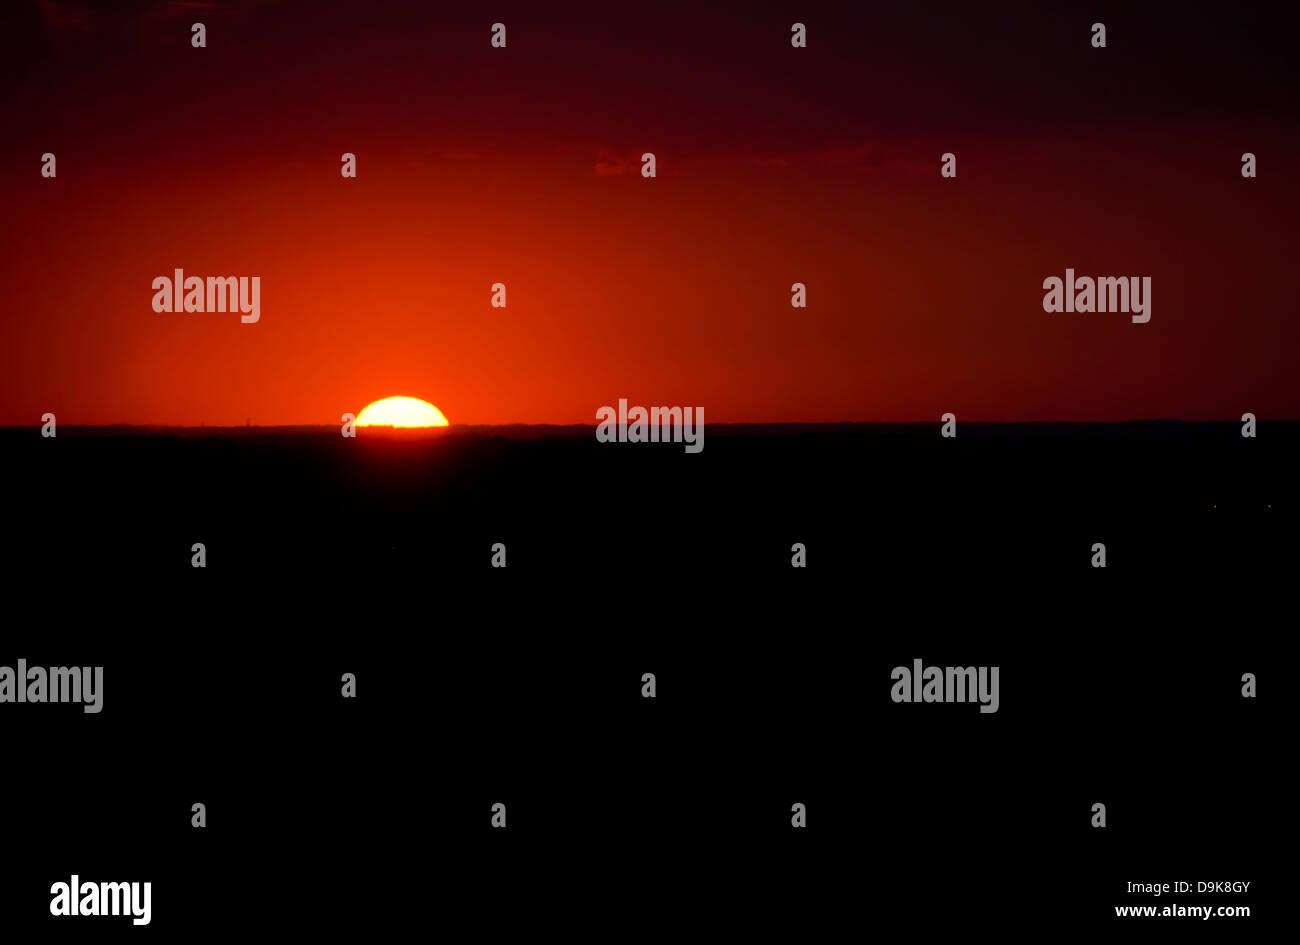 Intense red dark sky illuminated by the setting sun on the horizon. - Stock Image